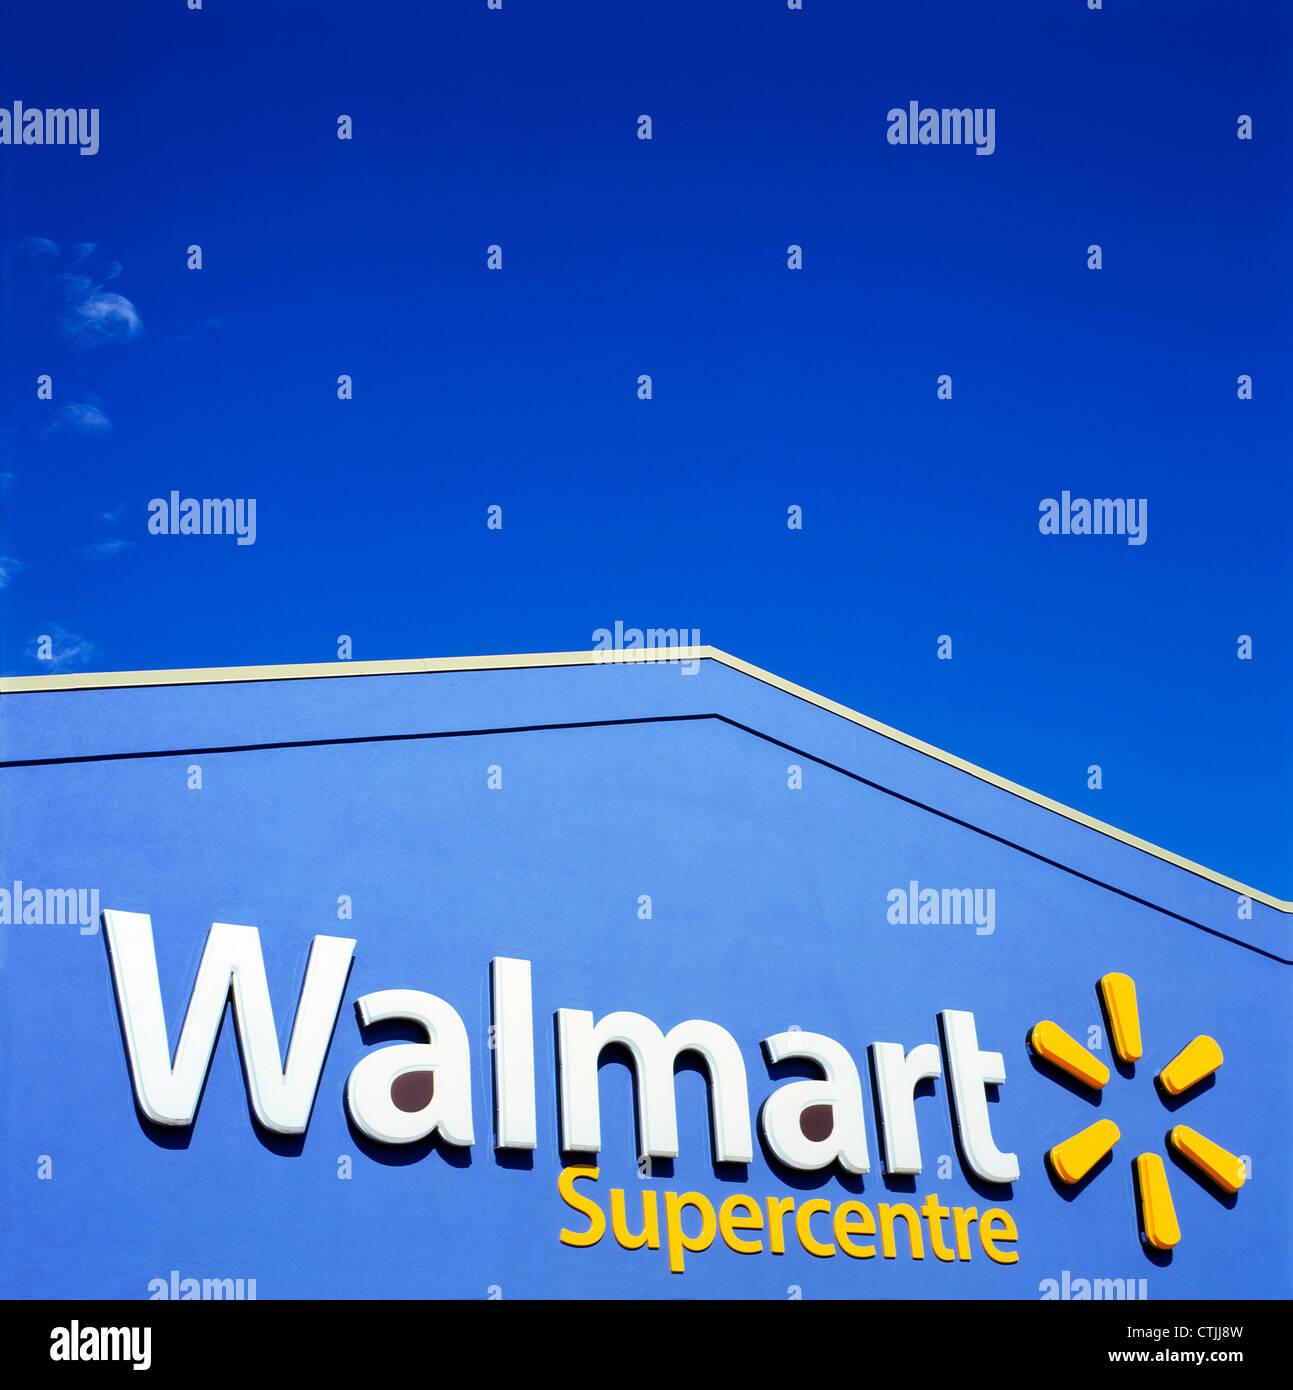 Walmart supercentre store exterior sign against a blue sky Ontario Canada  KATHY DEWITT - Stock Image